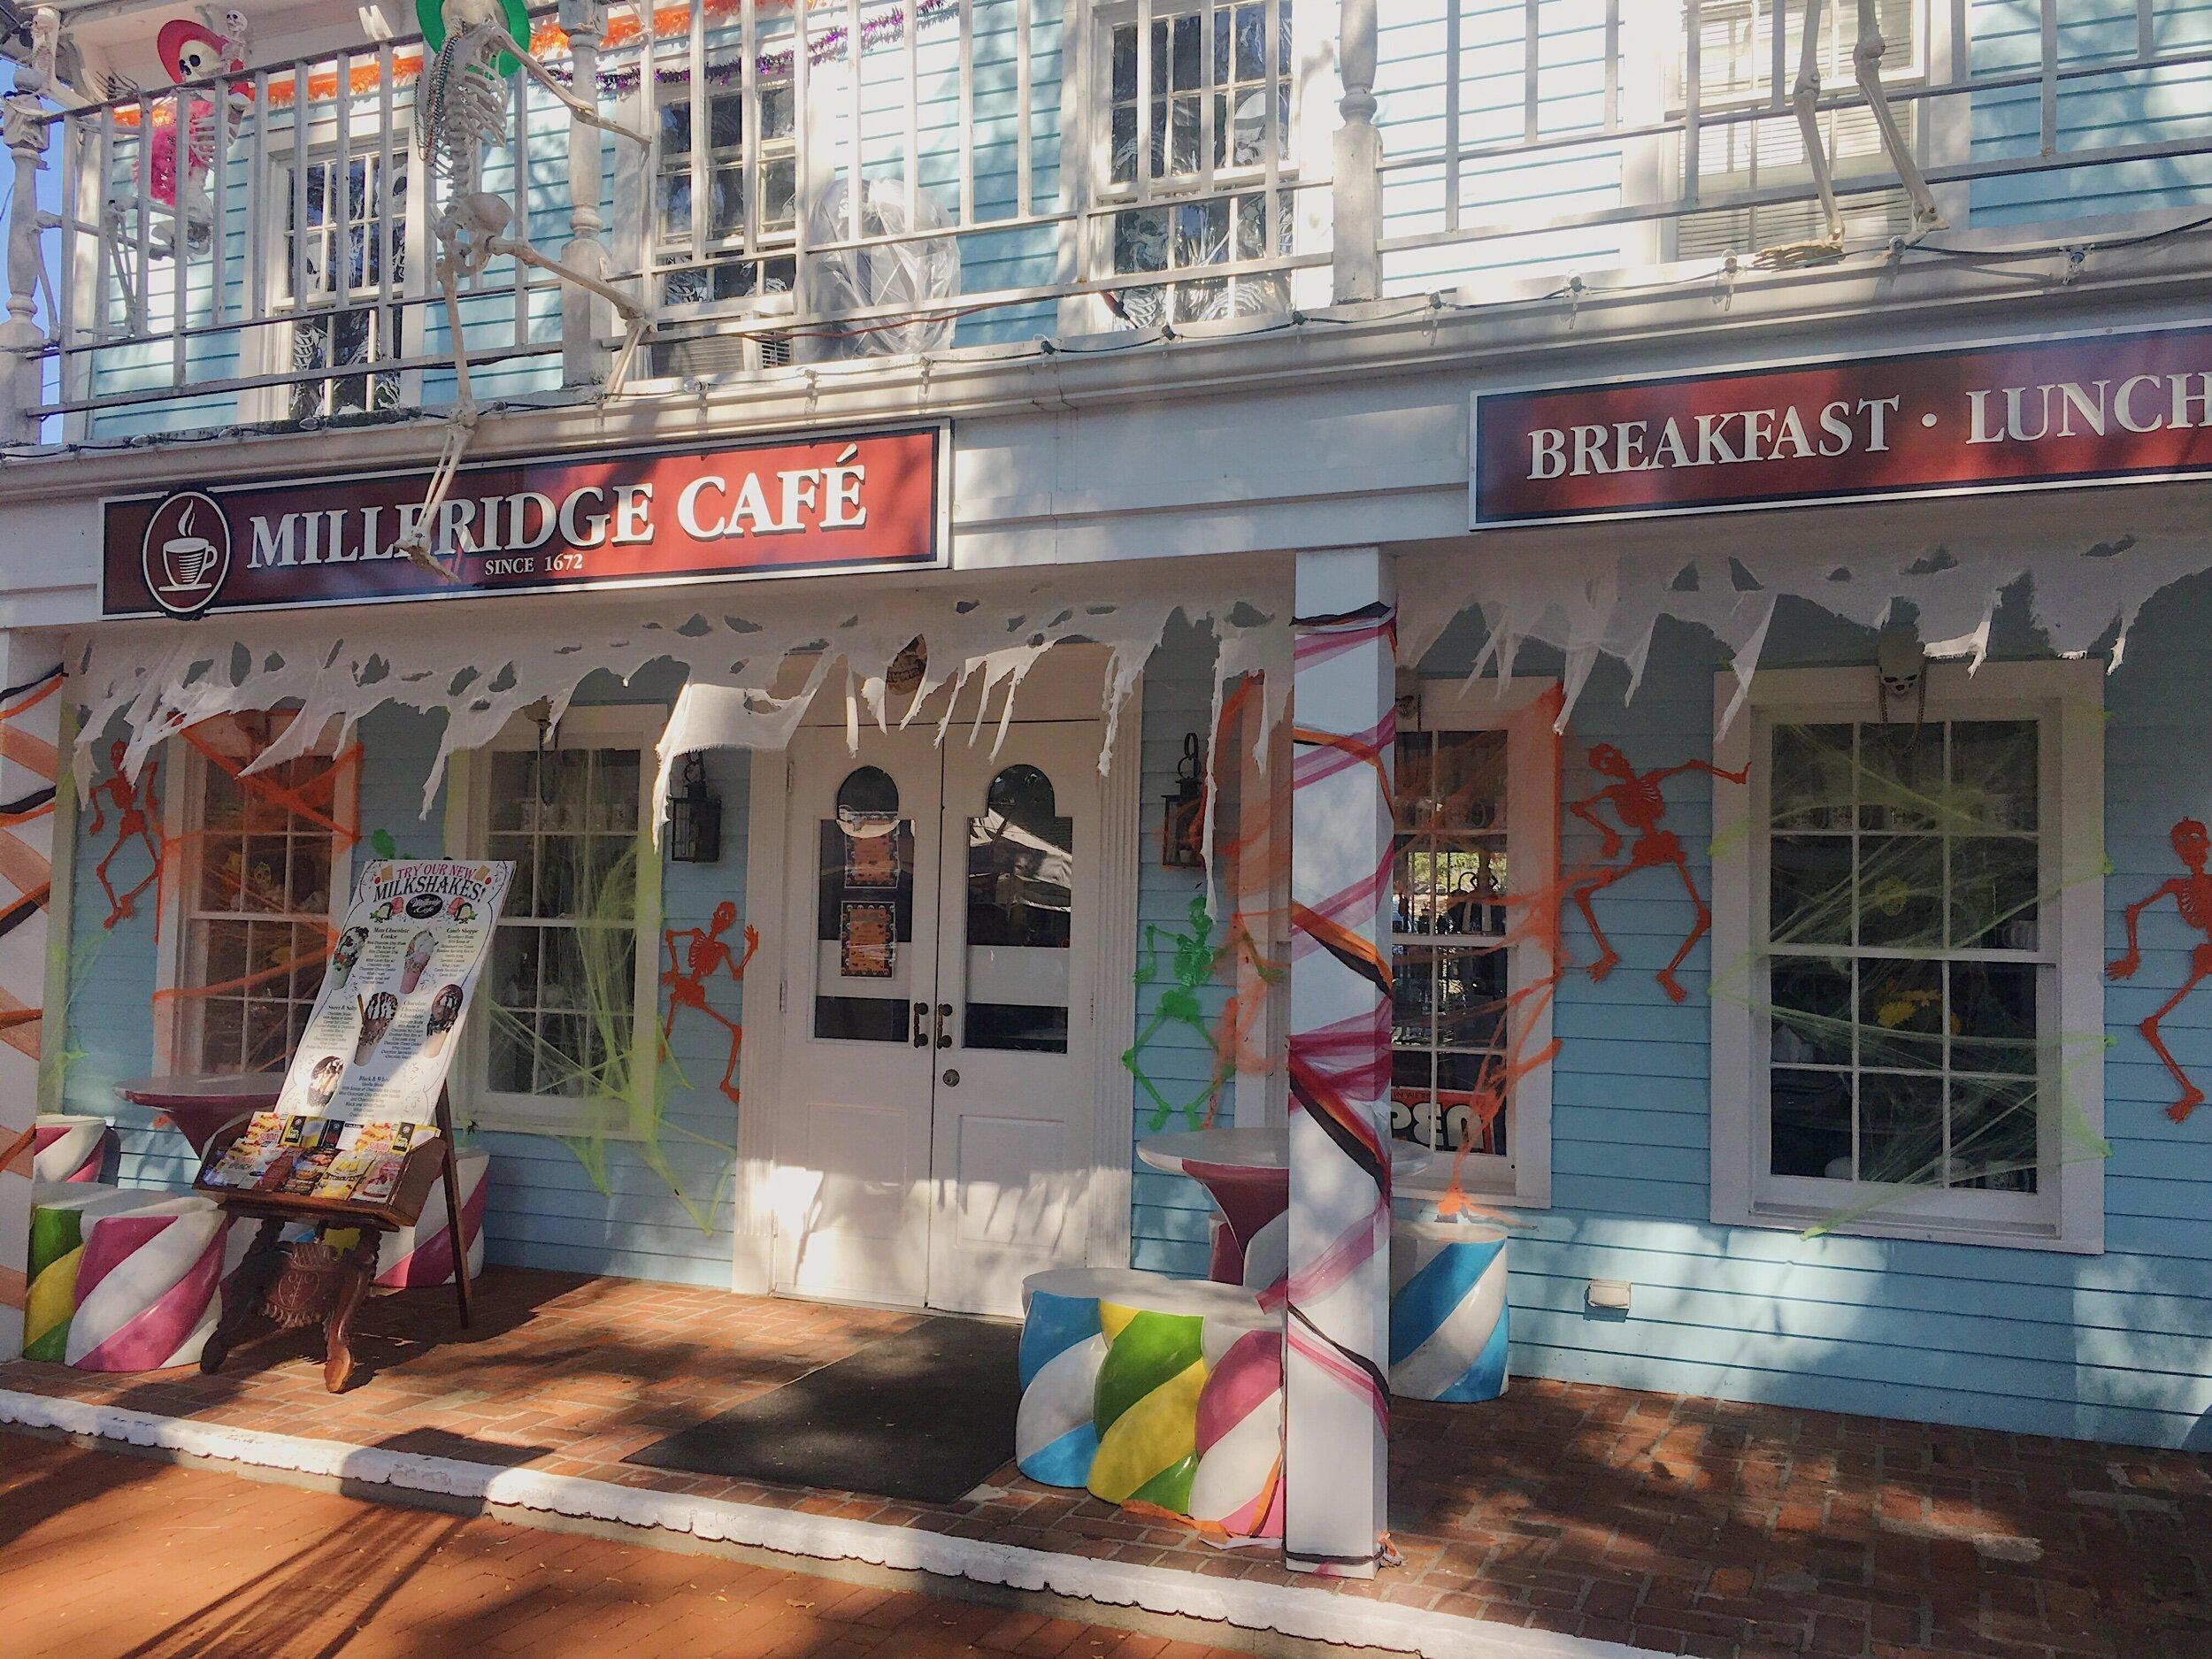 Storefront of Milleridge Cafe